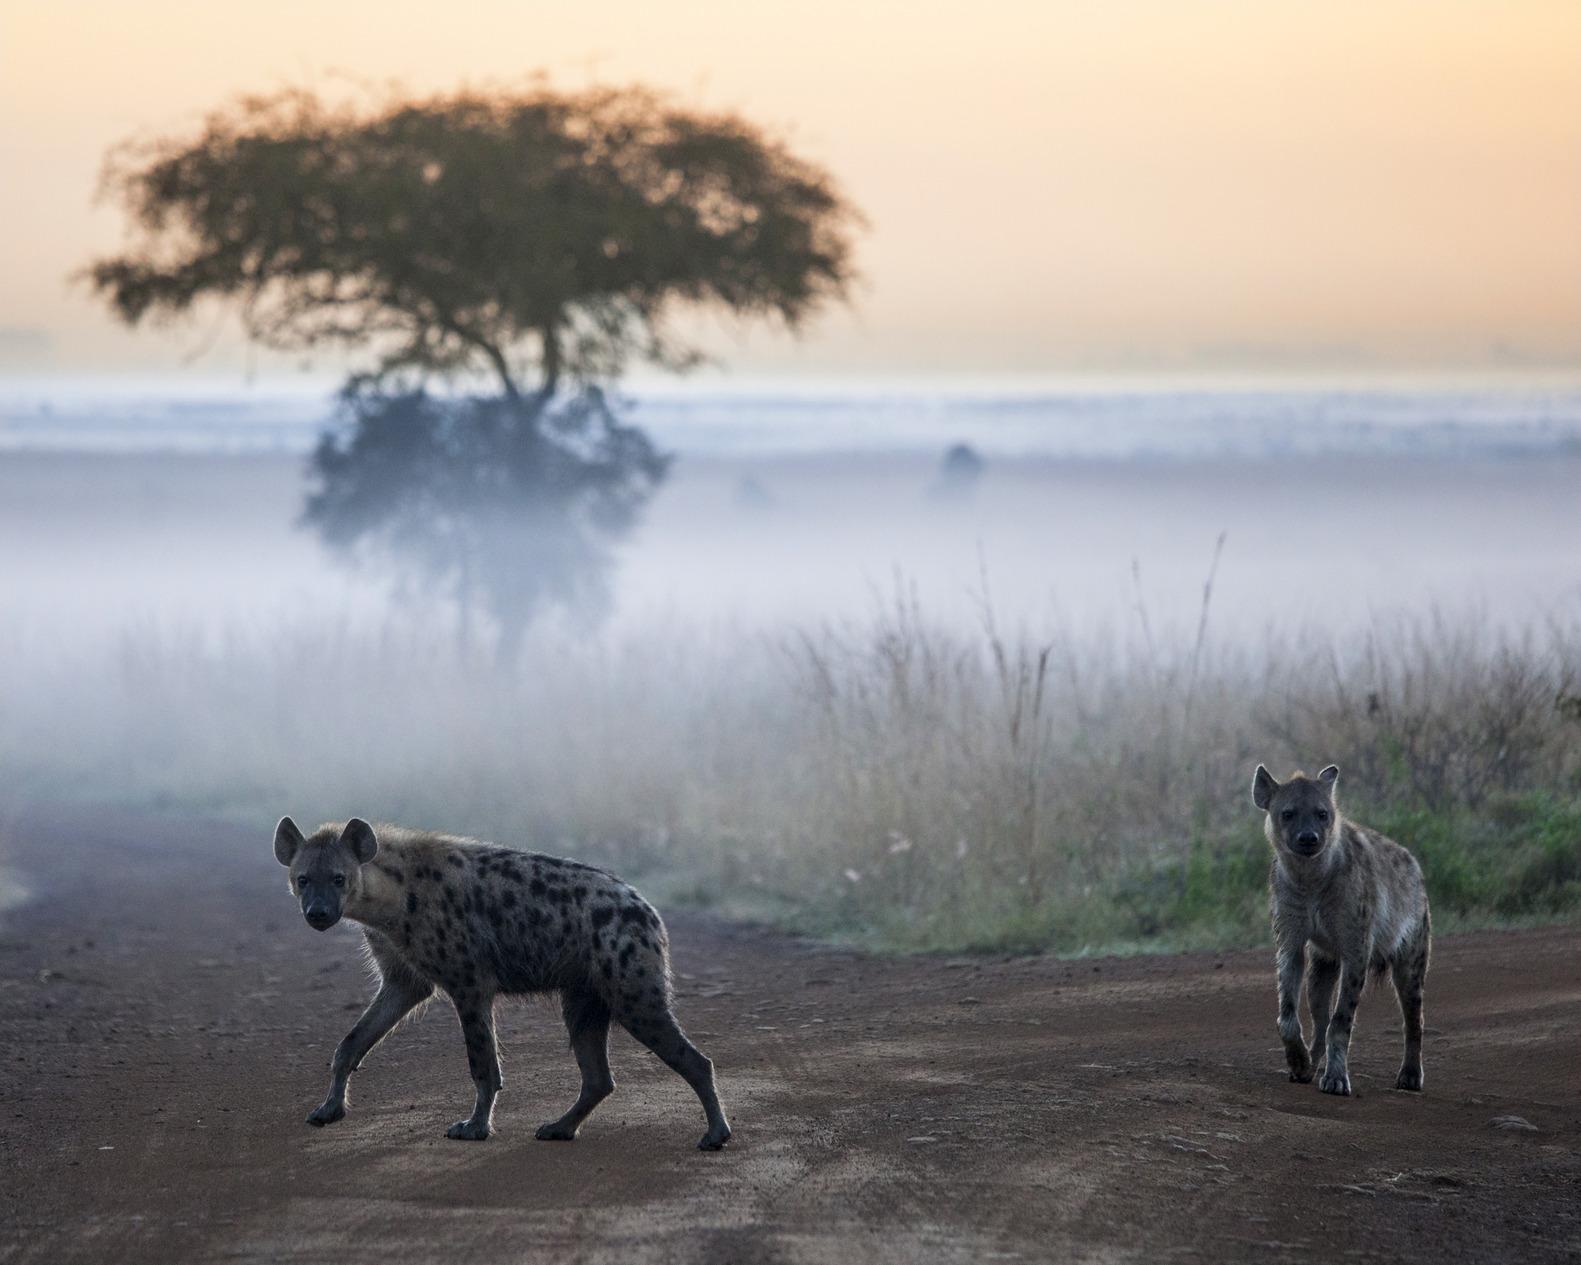 hyenas before dawn in the fog, Nairobi National Park